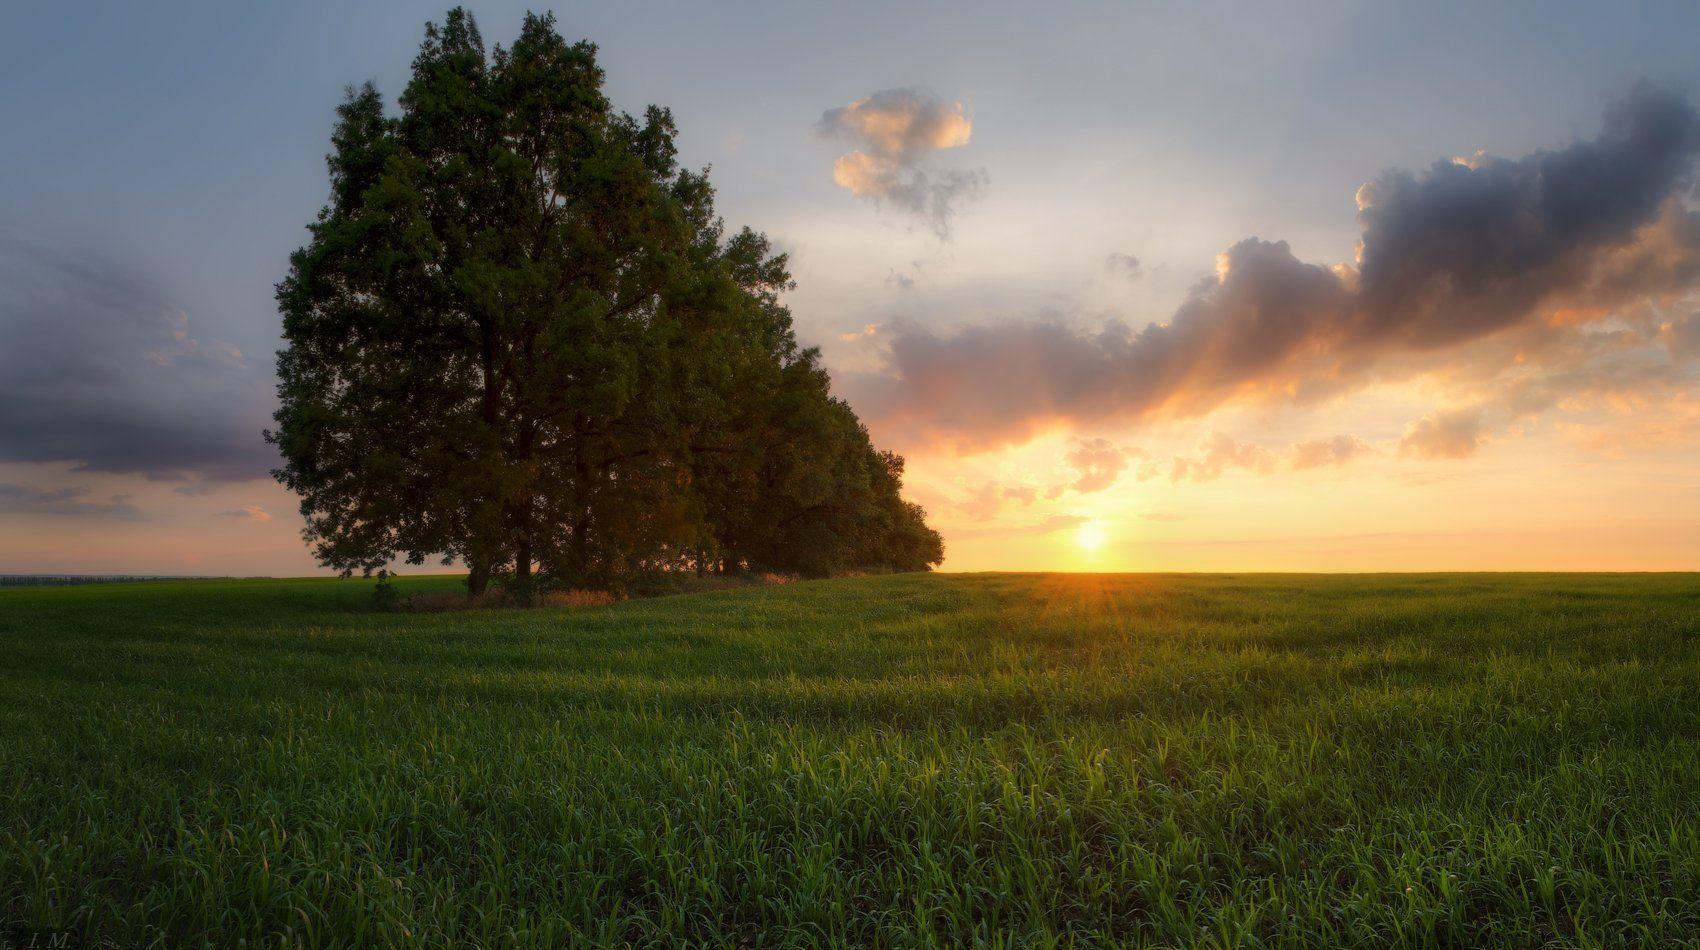 вечер, закат, поле, деревья, роща, облака, свет, лето, июнь, Summer, evening, light, trees, field, sunset, clouds, sky, panorama, wide angle, june, панорама, oak, grove, grass, , I'M